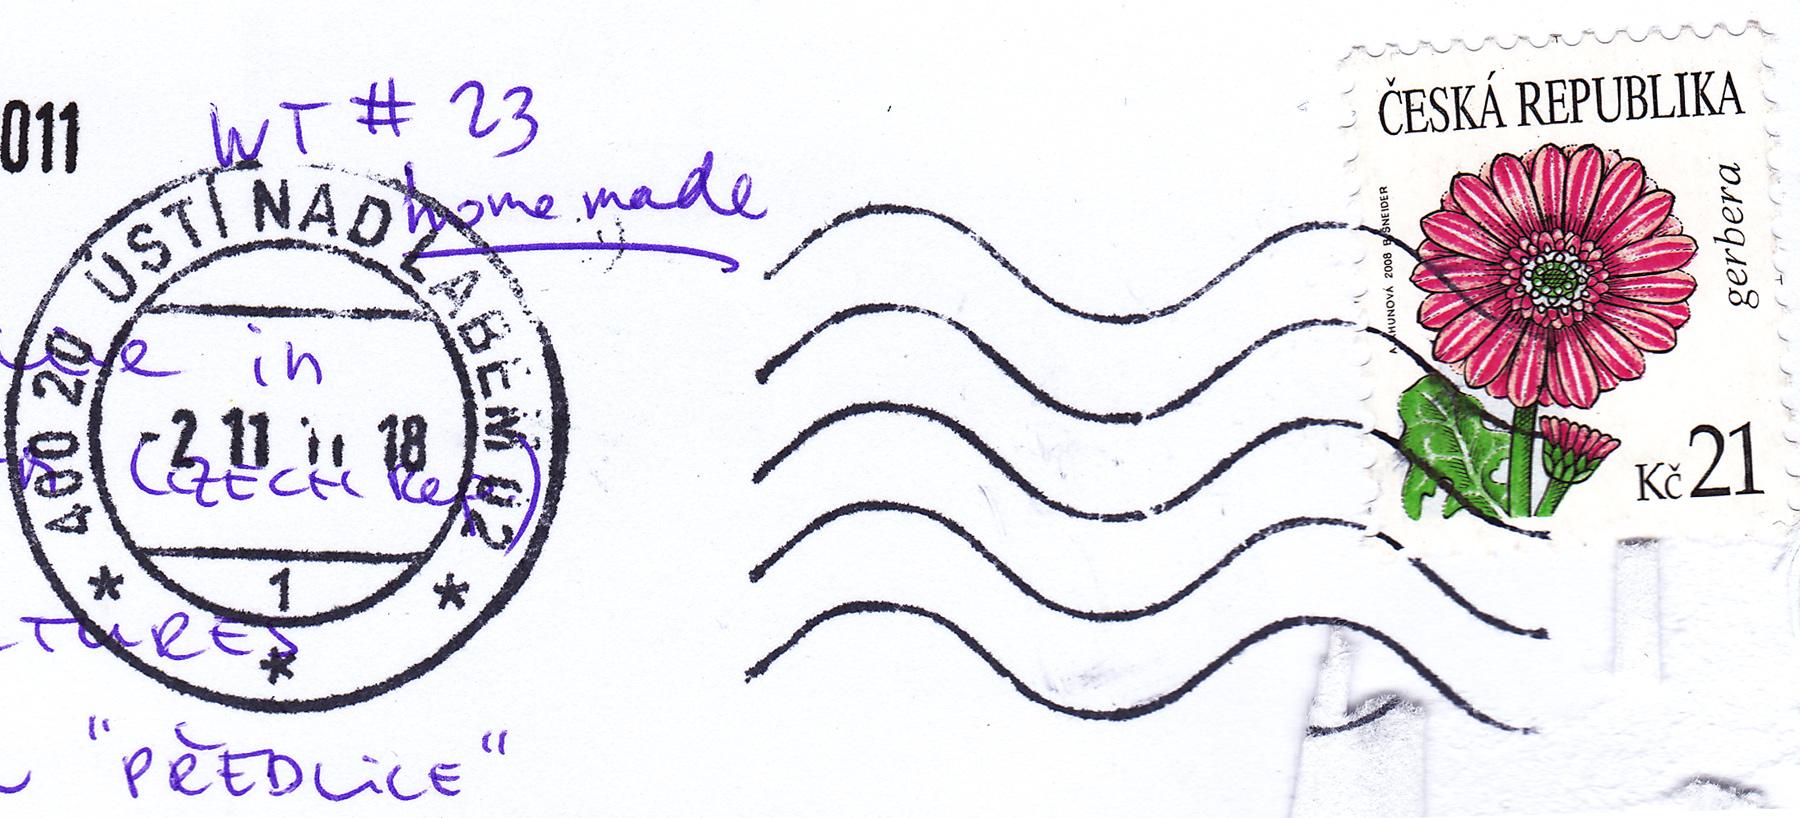 Mind Your Postcard Kate Deltiolog Page Postcard Stamps Price Forever Postcard Stamps A New Source inspiration Post Card Stamps